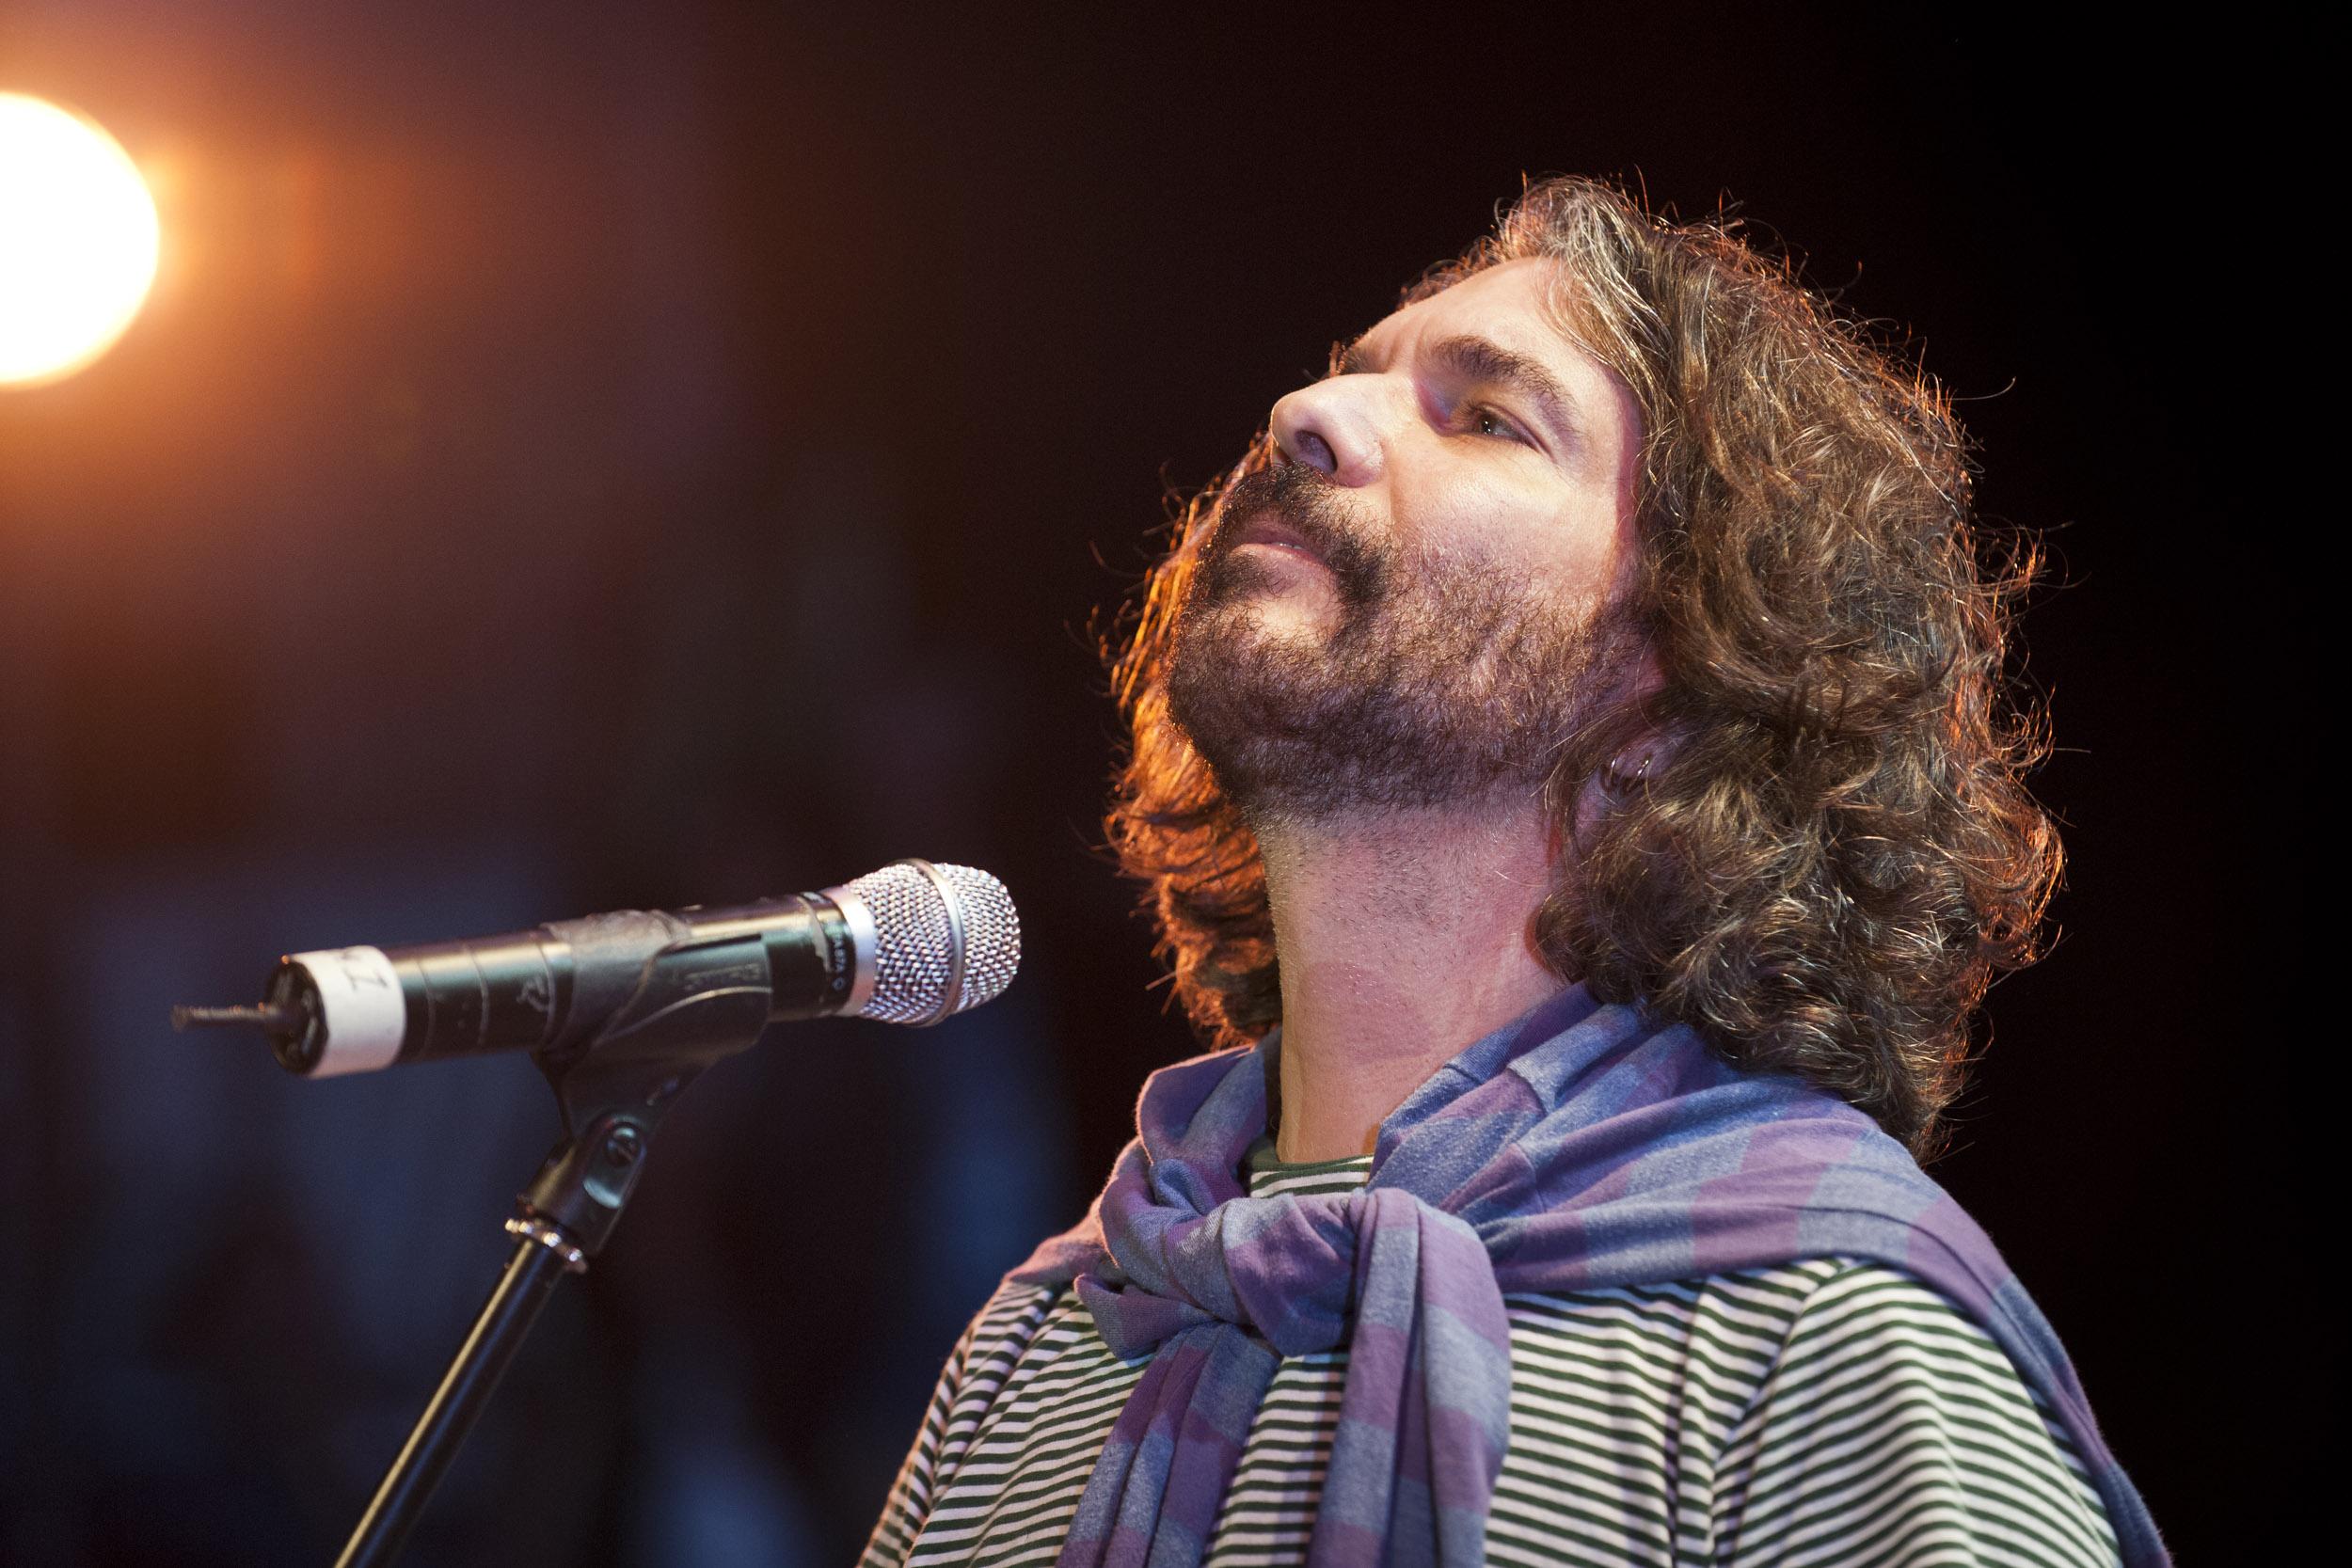 Santiago Feliú, musician - Illuminated Cuba - Hector Garrido, Aerial and human photography